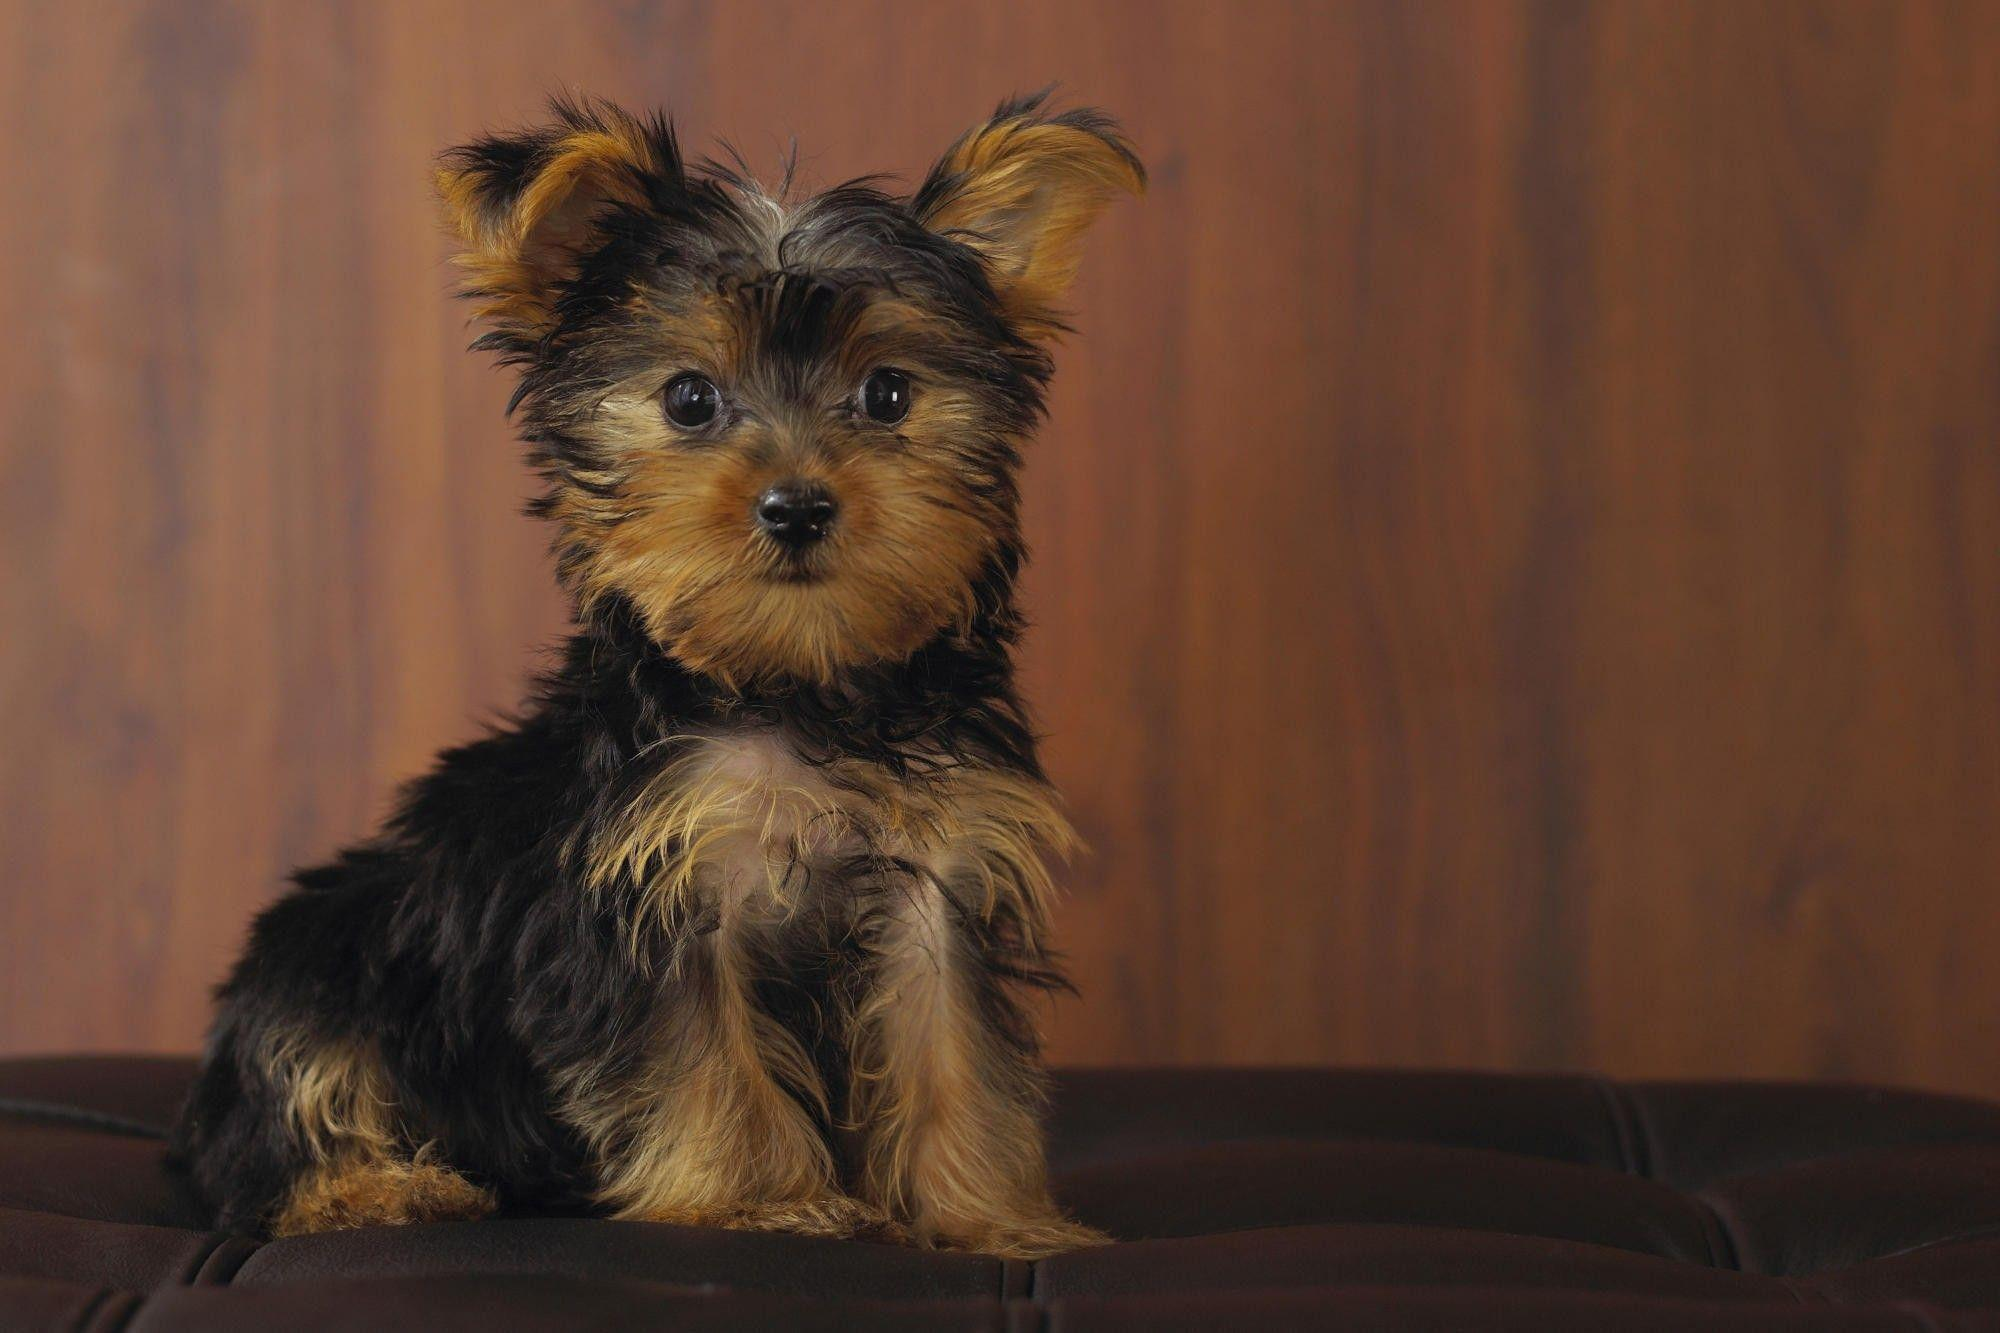 yorkshire terrier wallpaper images